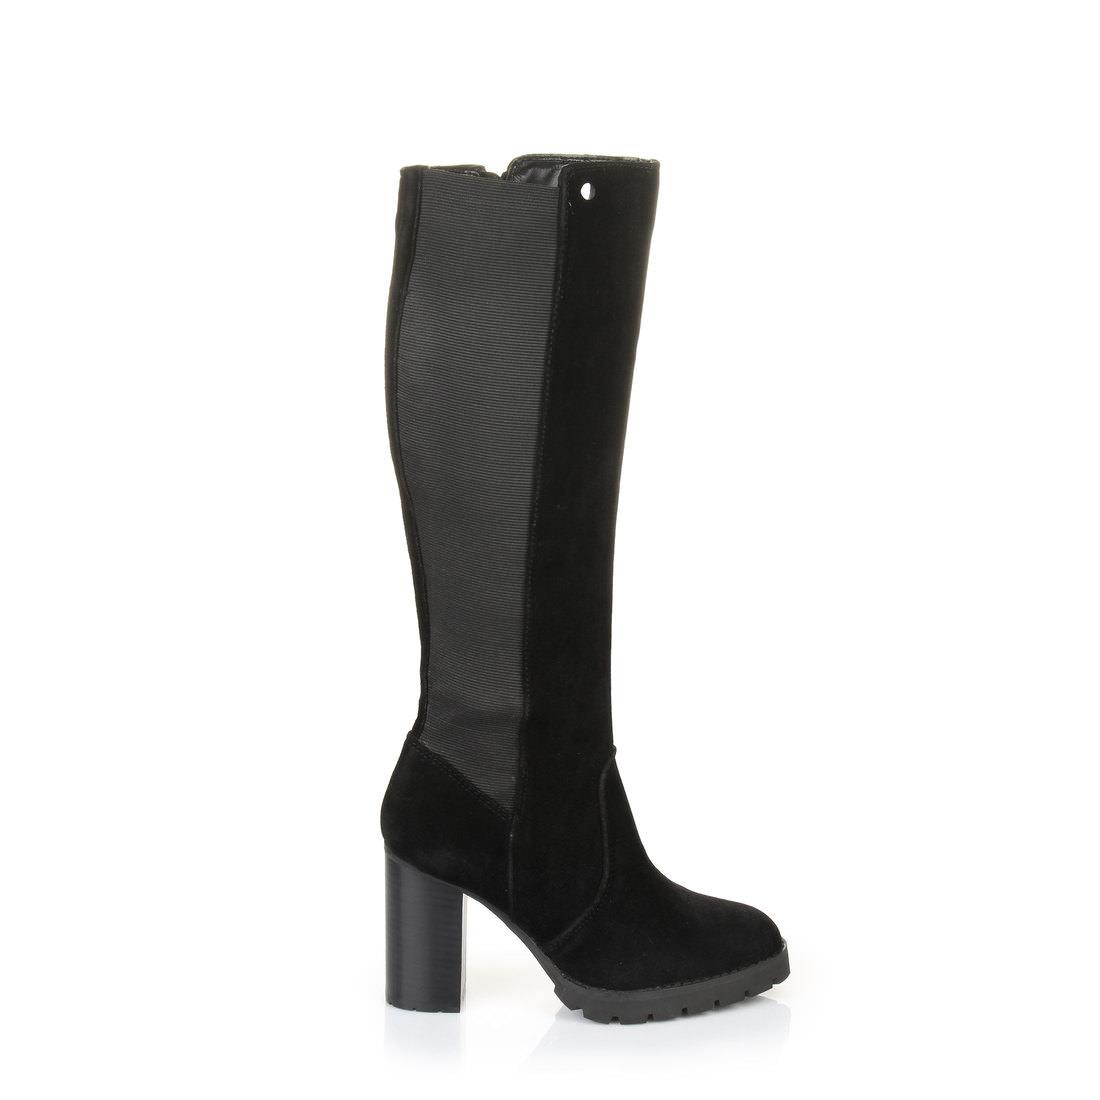 buffalo shoes damen b493c 72 s0019f imi suede stiefel schwarz black 01 37 eu botschaft. Black Bedroom Furniture Sets. Home Design Ideas